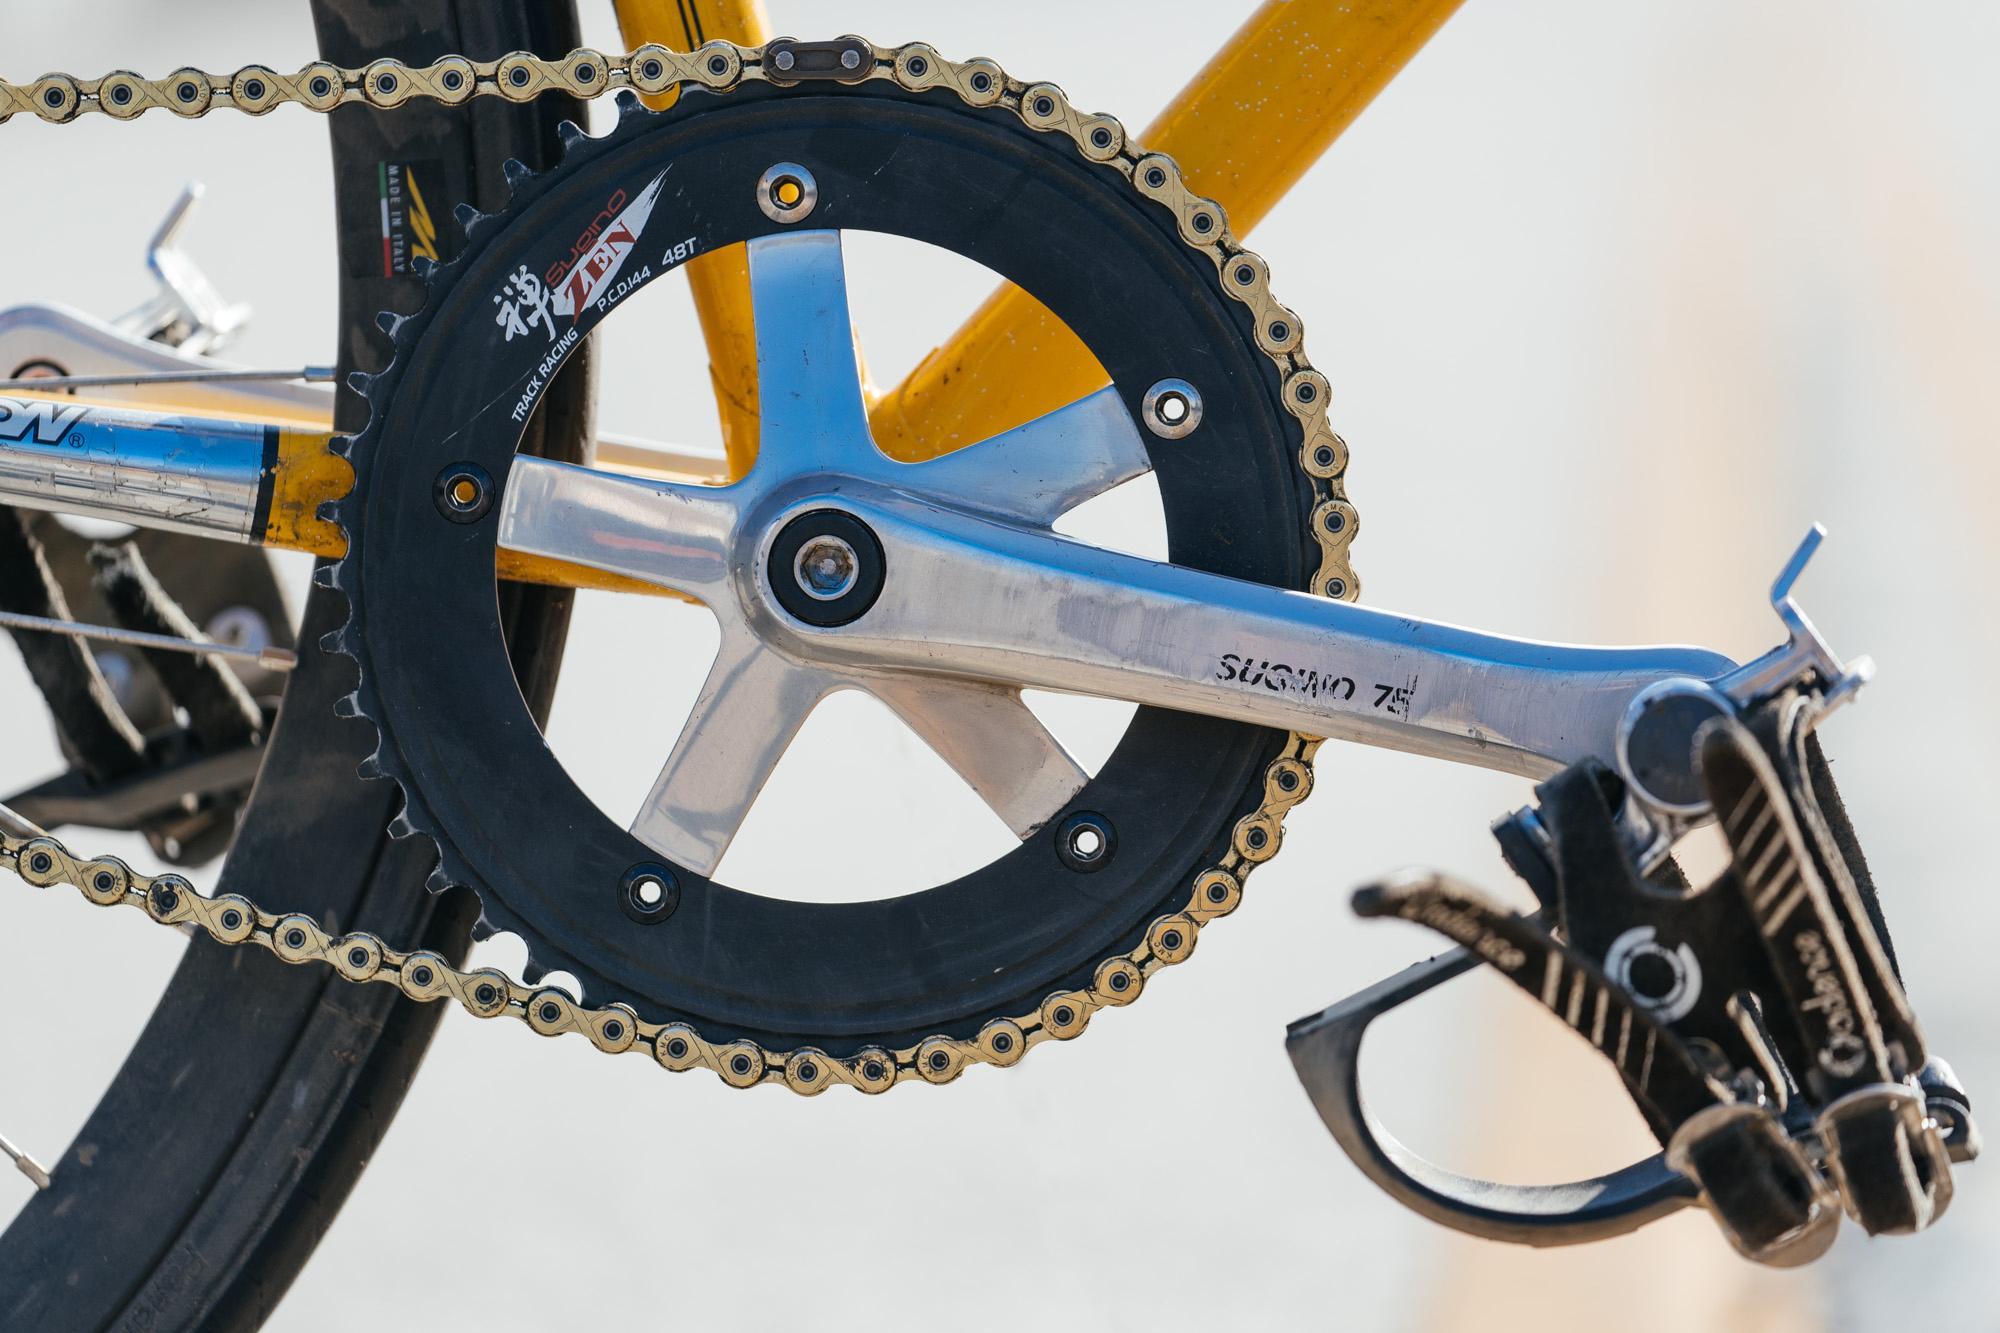 Lucas' Samson Street Track Bike